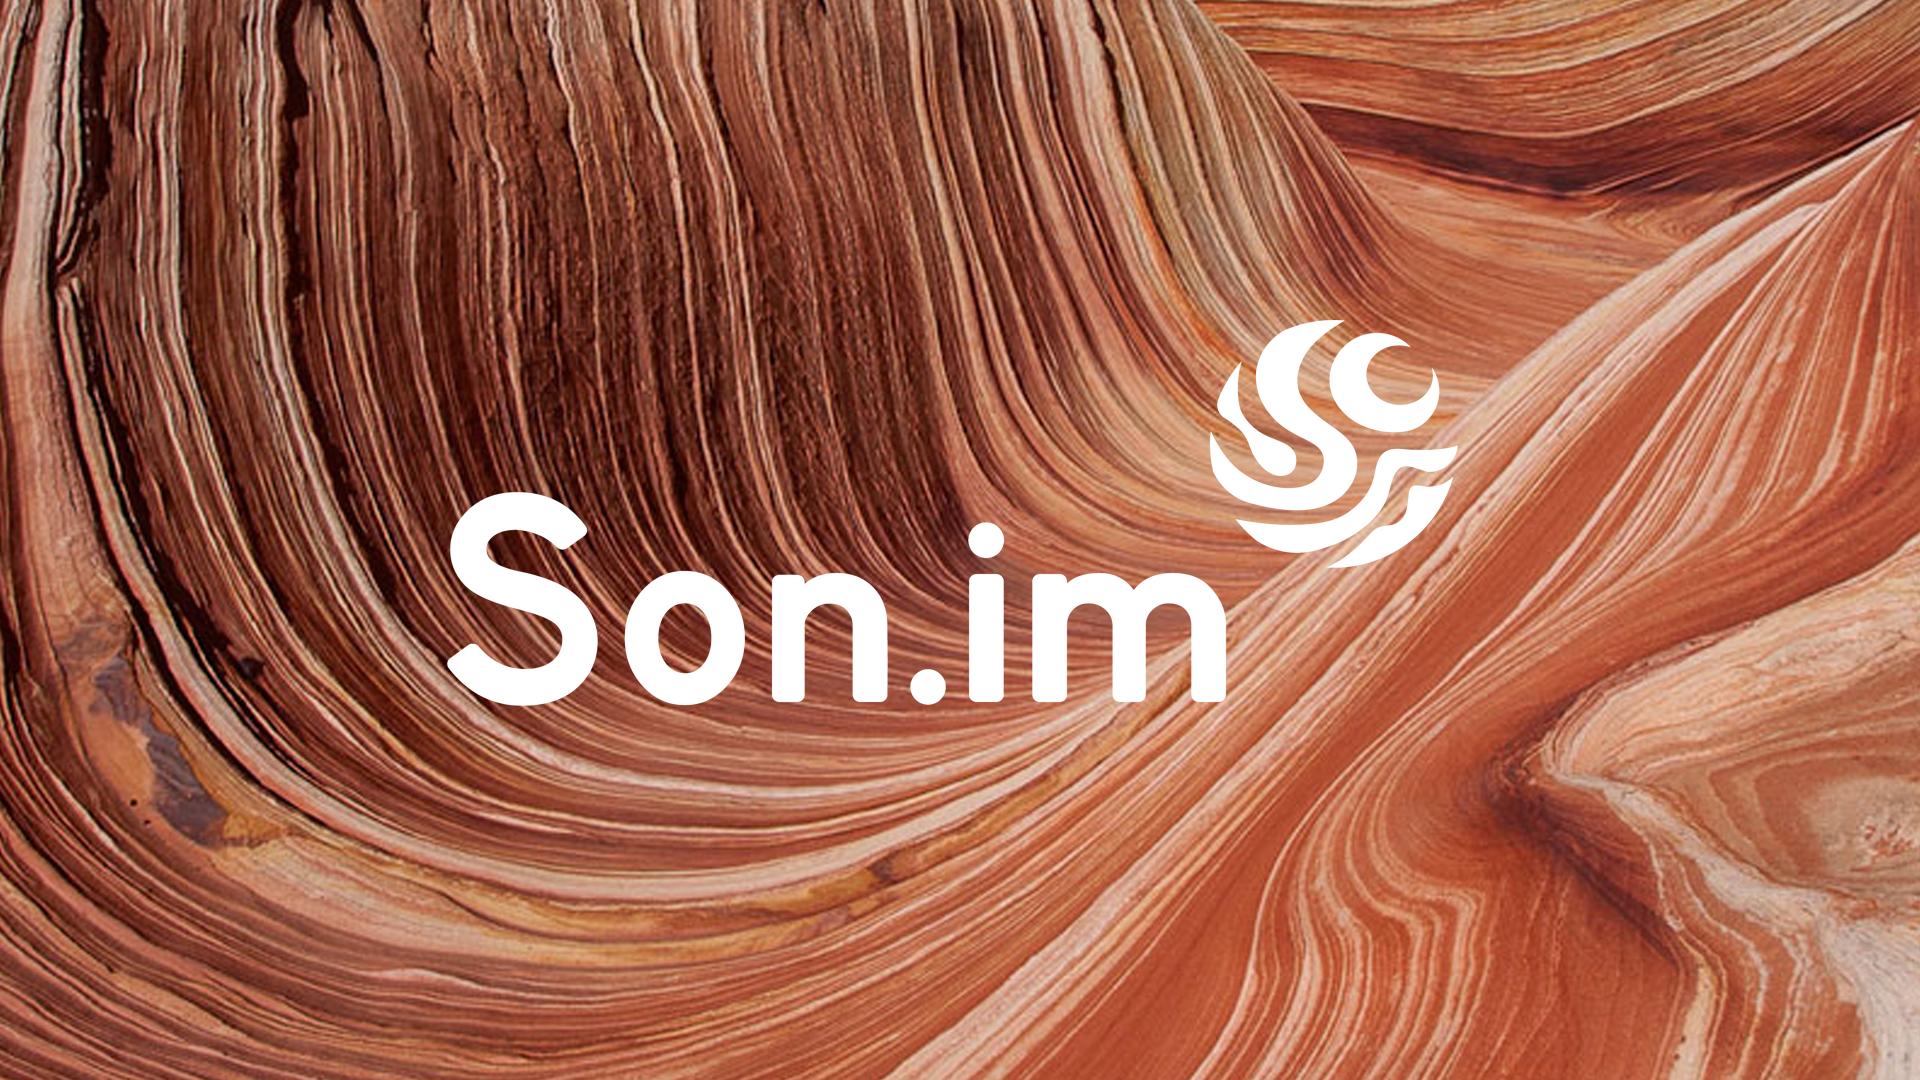 Sonim_logo_BG_Coyote_Buttes